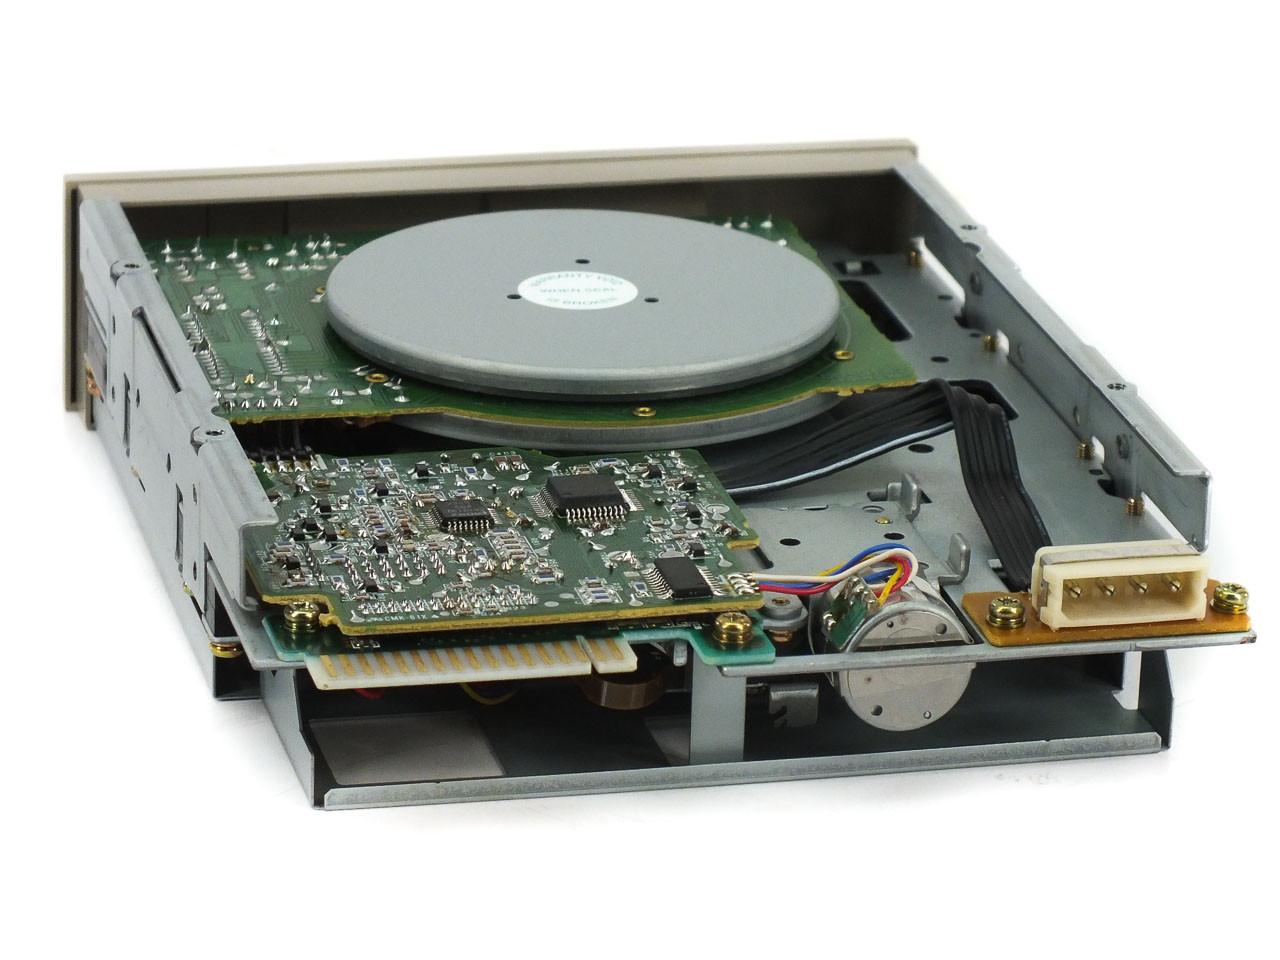 "Newtronics D509V3 Mitsumi 1.2MB 5.25/"" Internal Floppy Drive FDD"